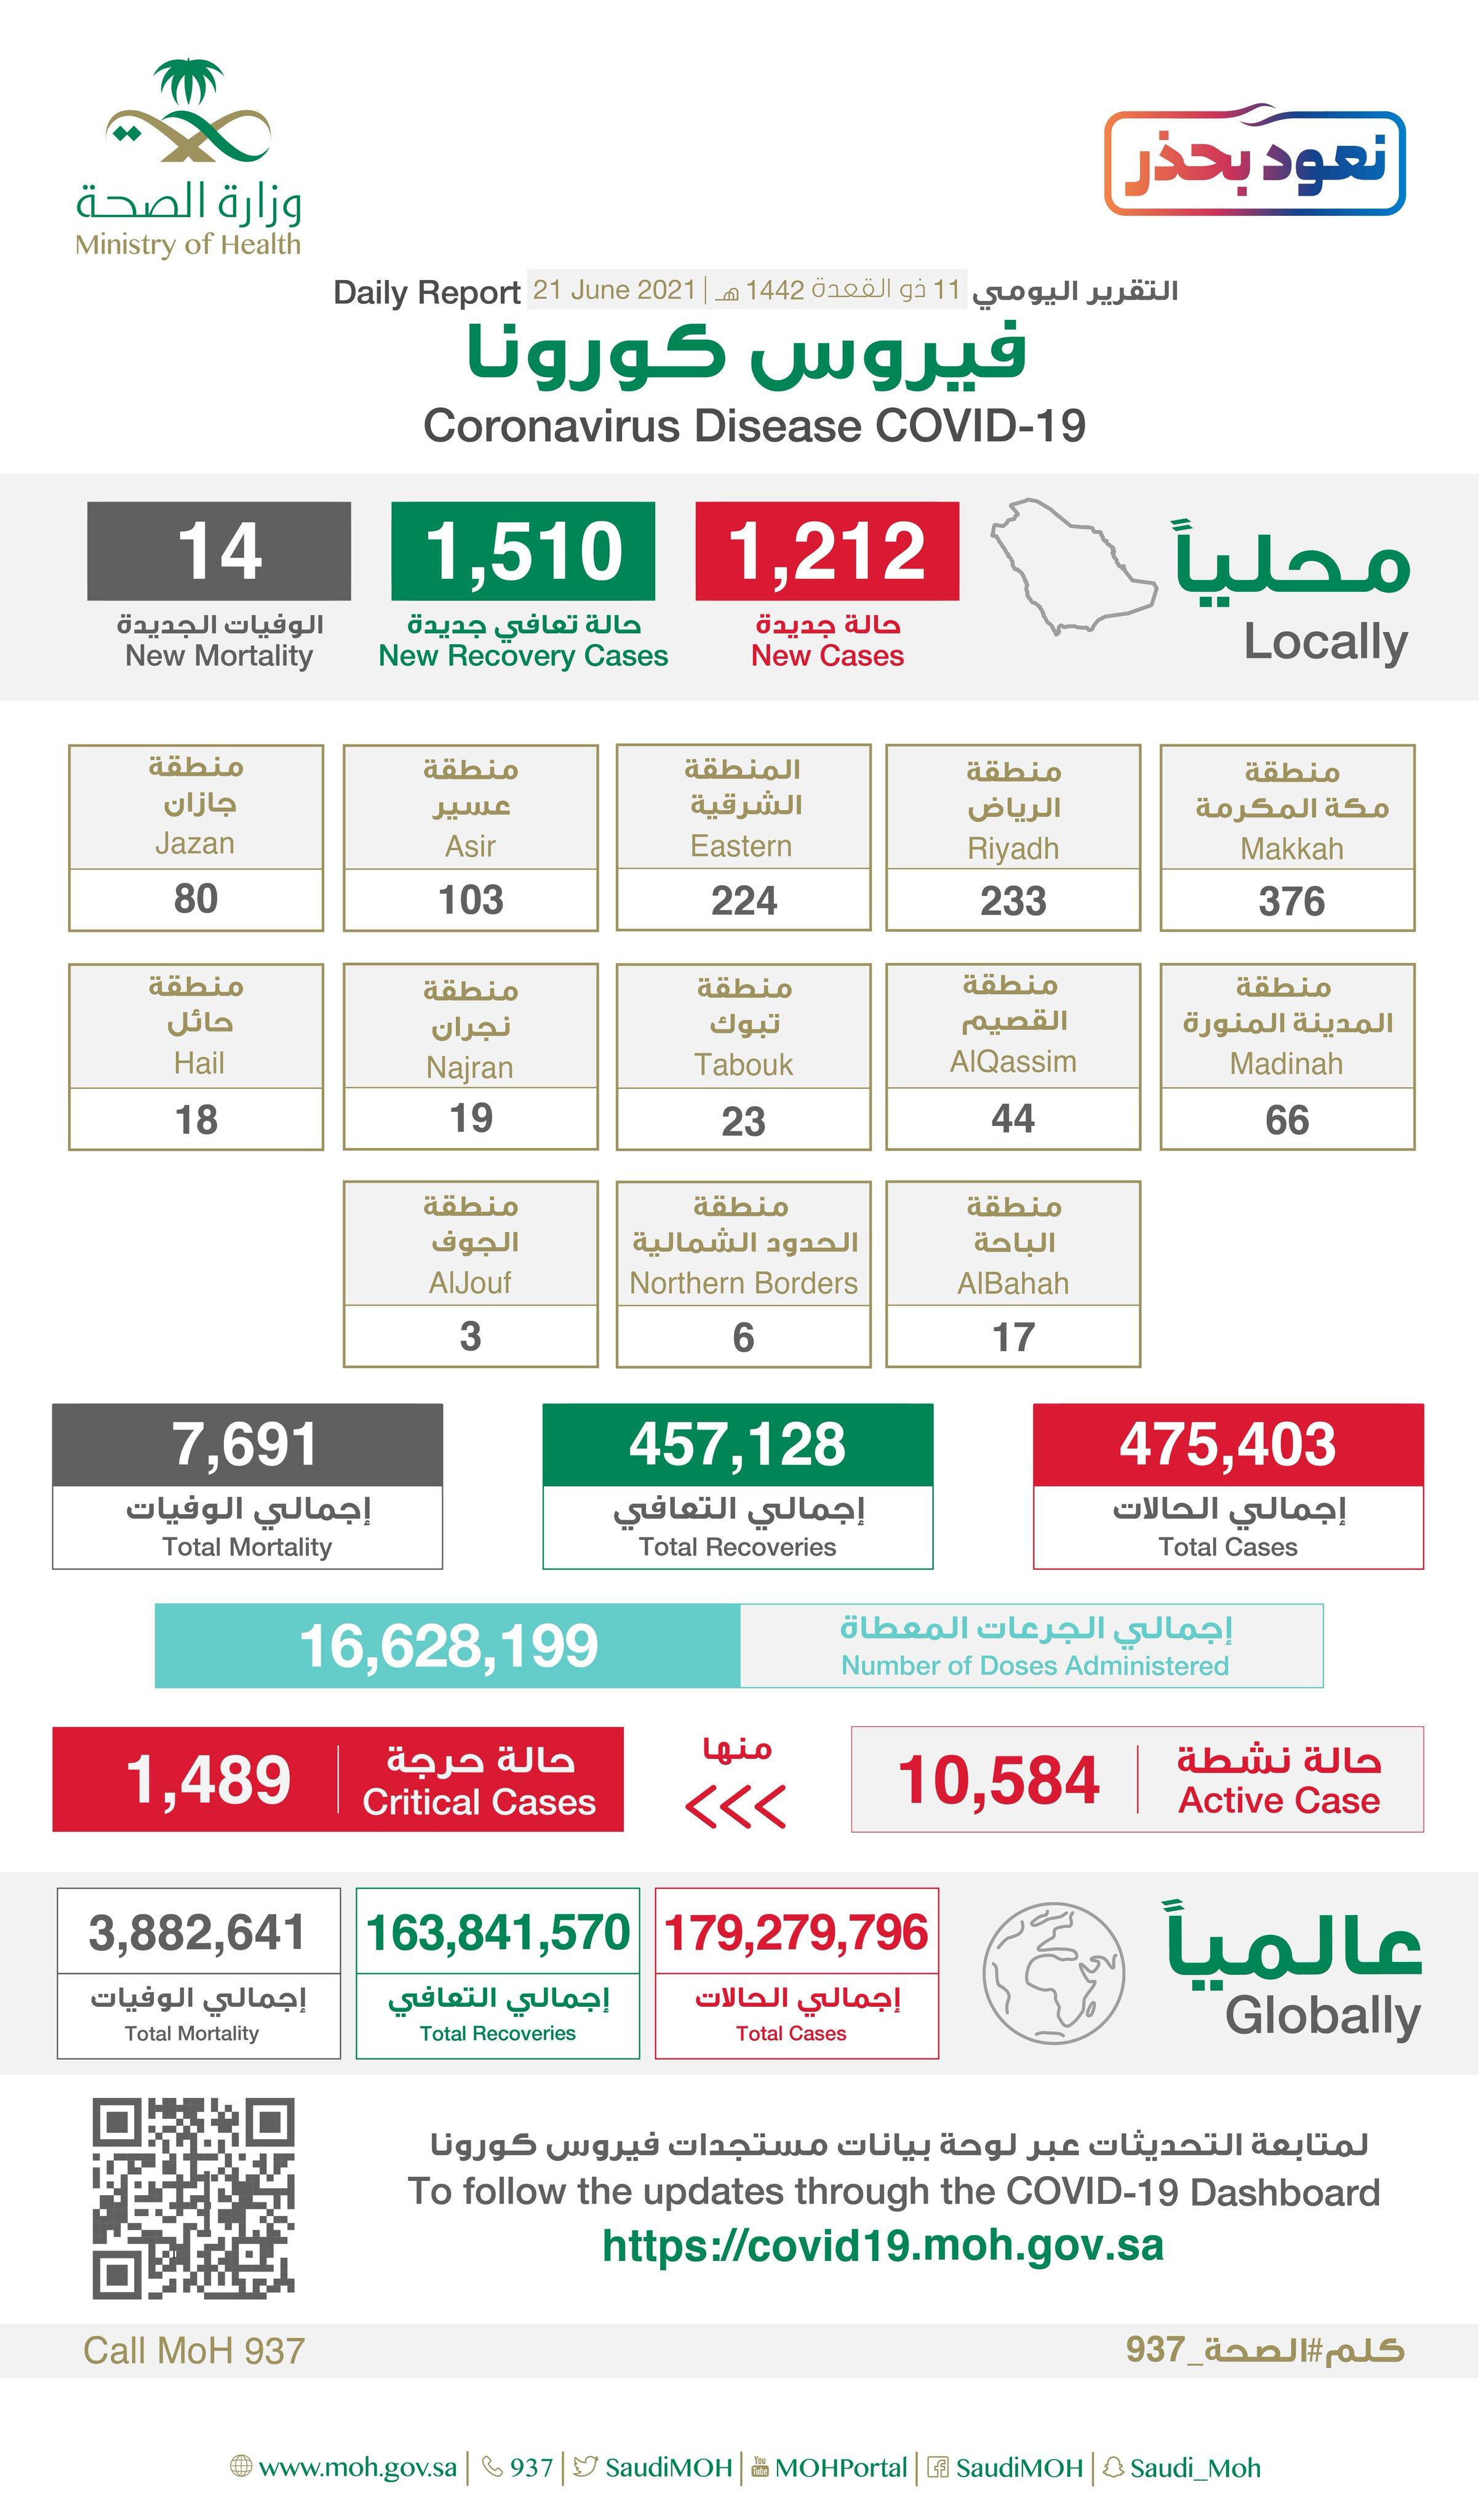 Saudi Arabia Coronavirus : Total Cases :475,403 , New Cases : 1,212 , Cured : 457,128 , Deaths: 7,691, Active Cases : 10,584